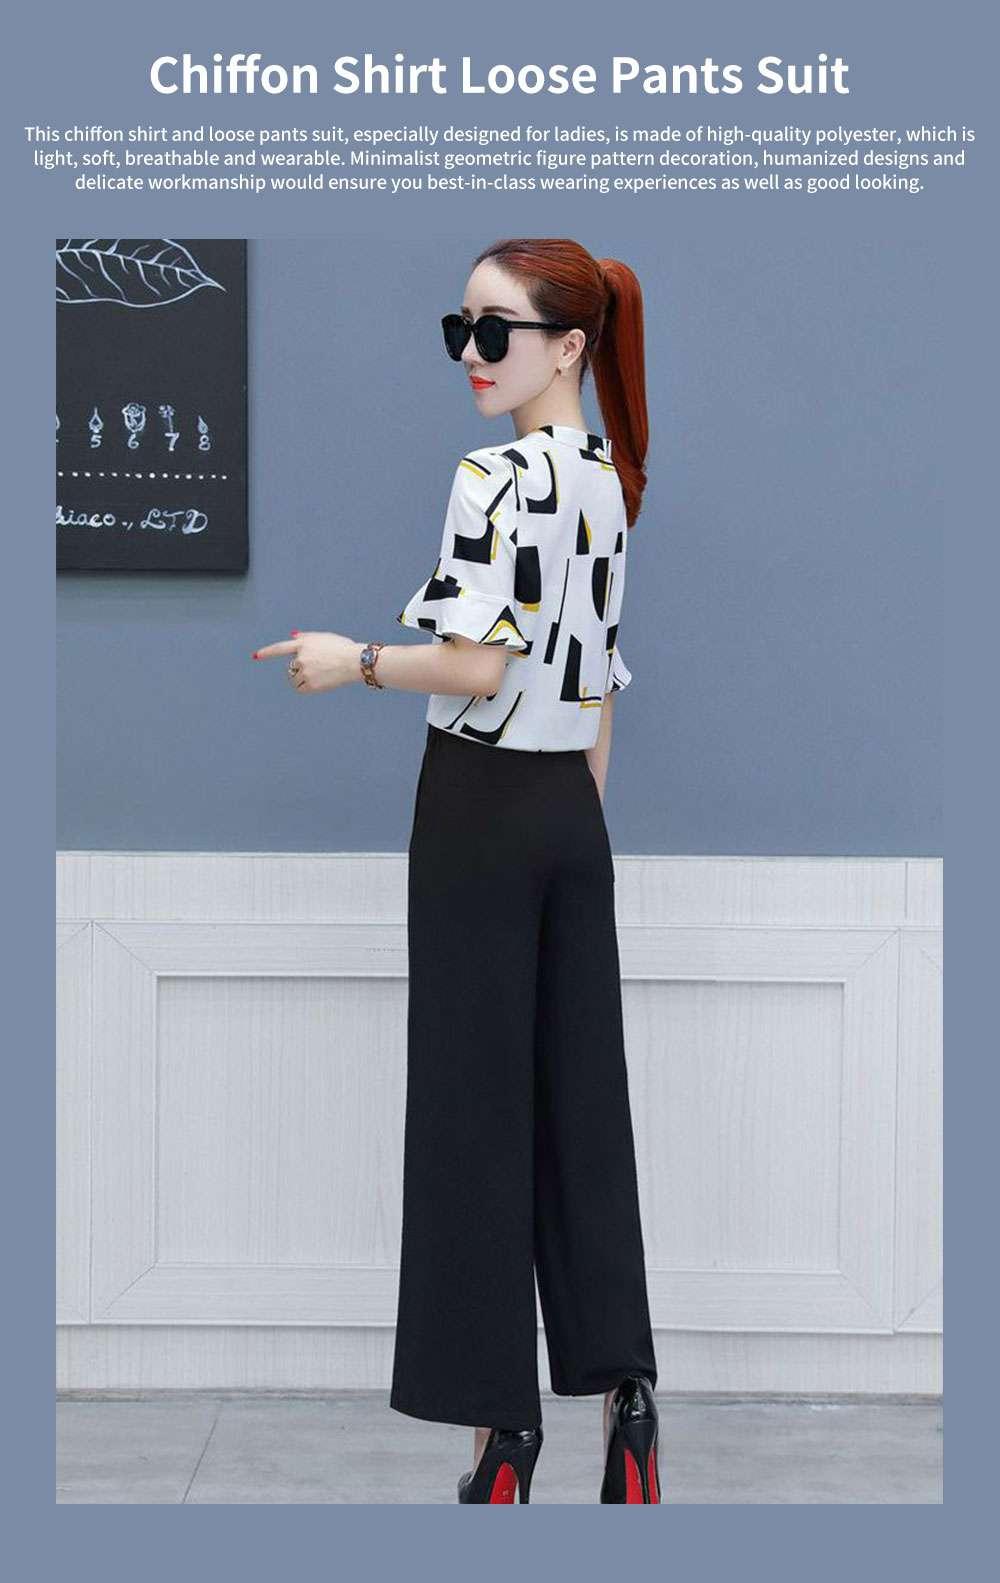 Stylish V-Neck Line Chiffon Shirt Loose Pants Suit for Ladies Minimalist Geometric Figure Pattern Decorative Tops with Falbala Sleeves 0